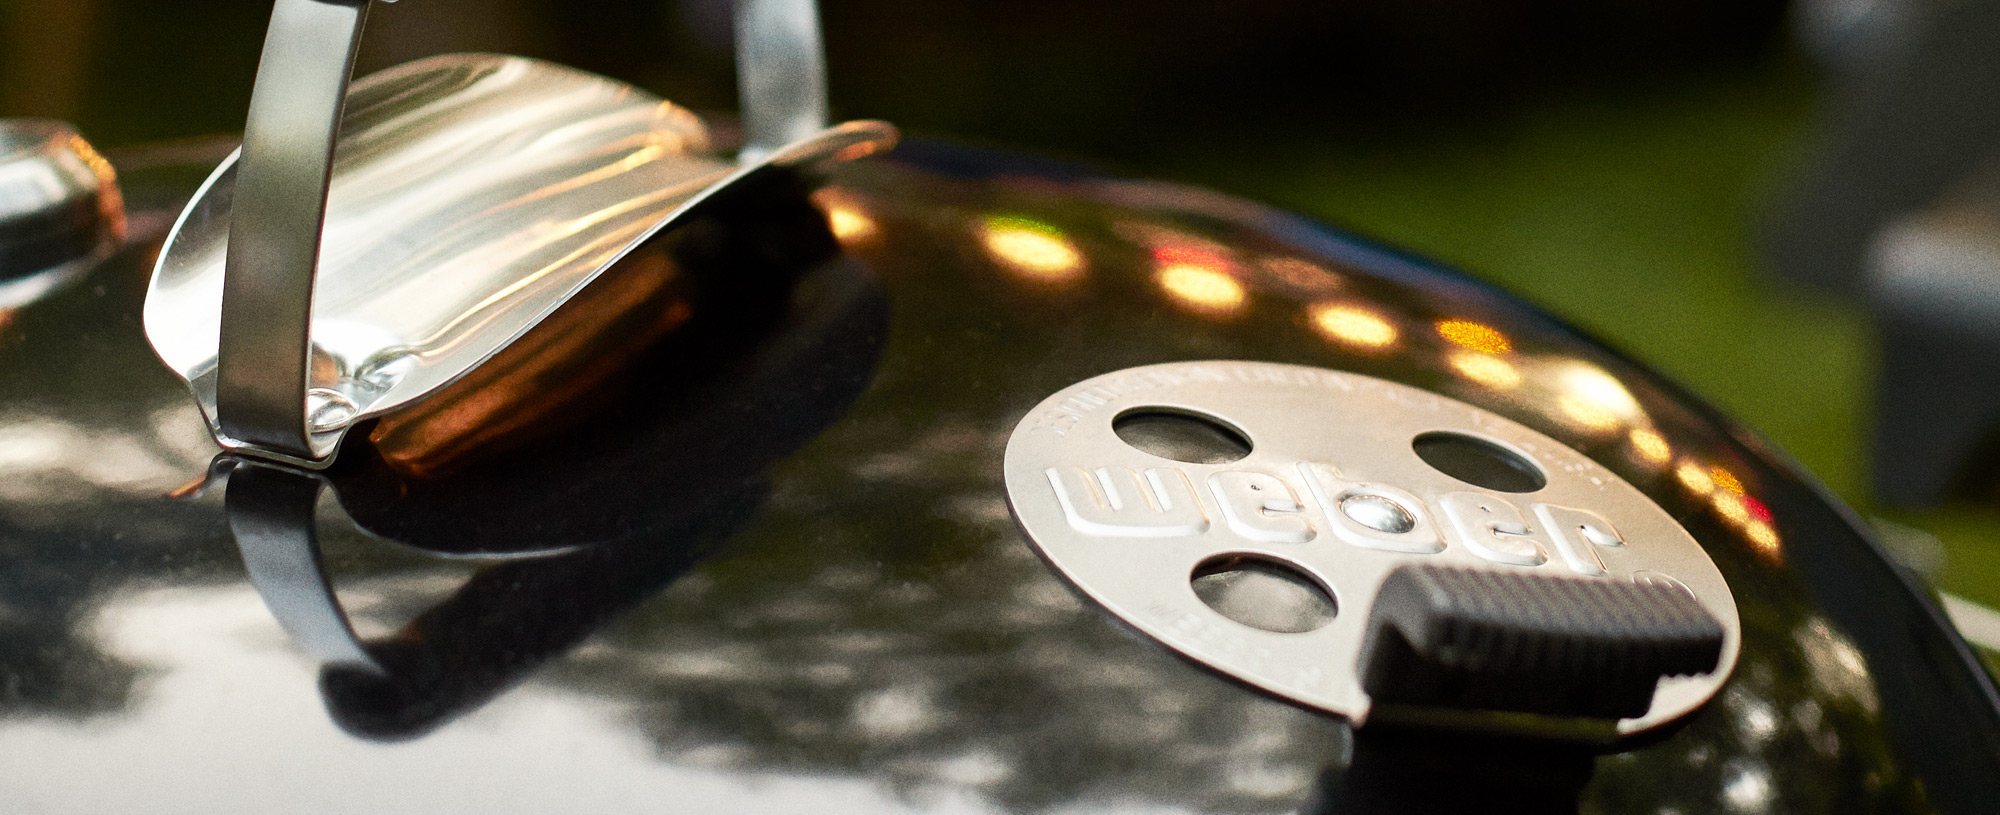 Weber grill ersatzteil weber grill ersatzteile for Ersatzteile weber grill